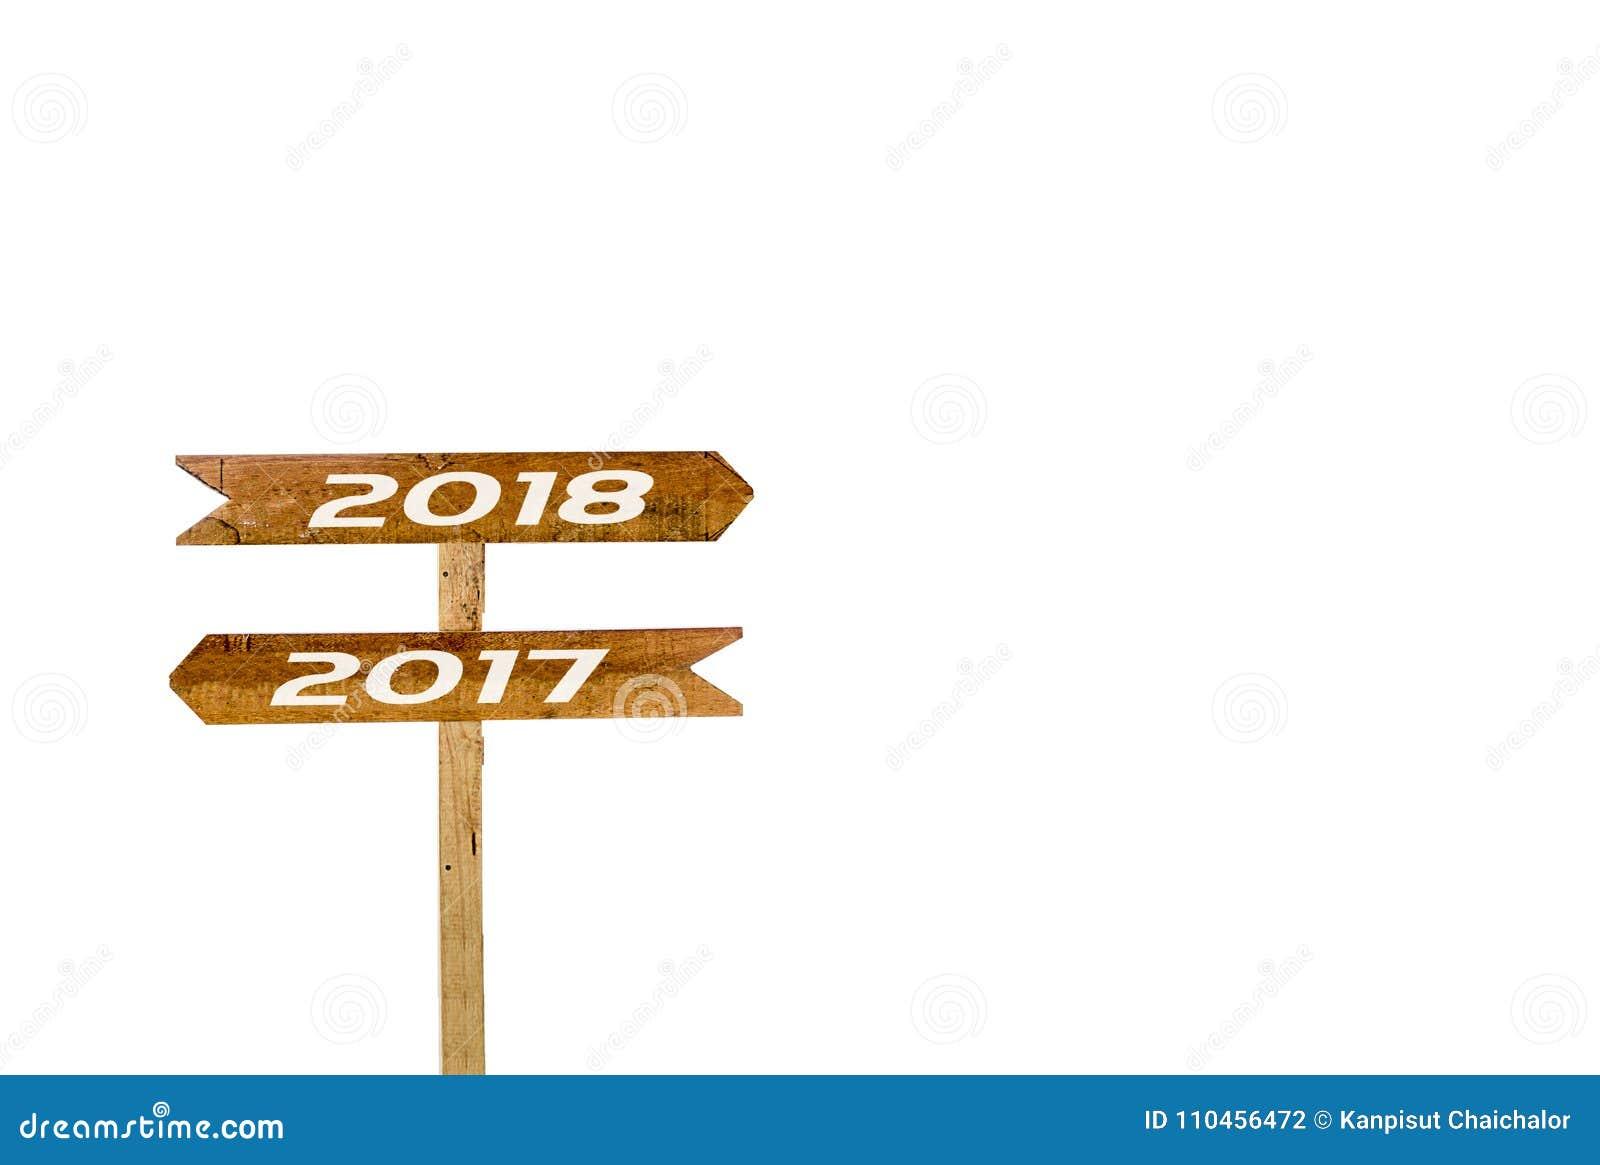 Underteckna banret 2017, 2018 isolerad vit bakgrund